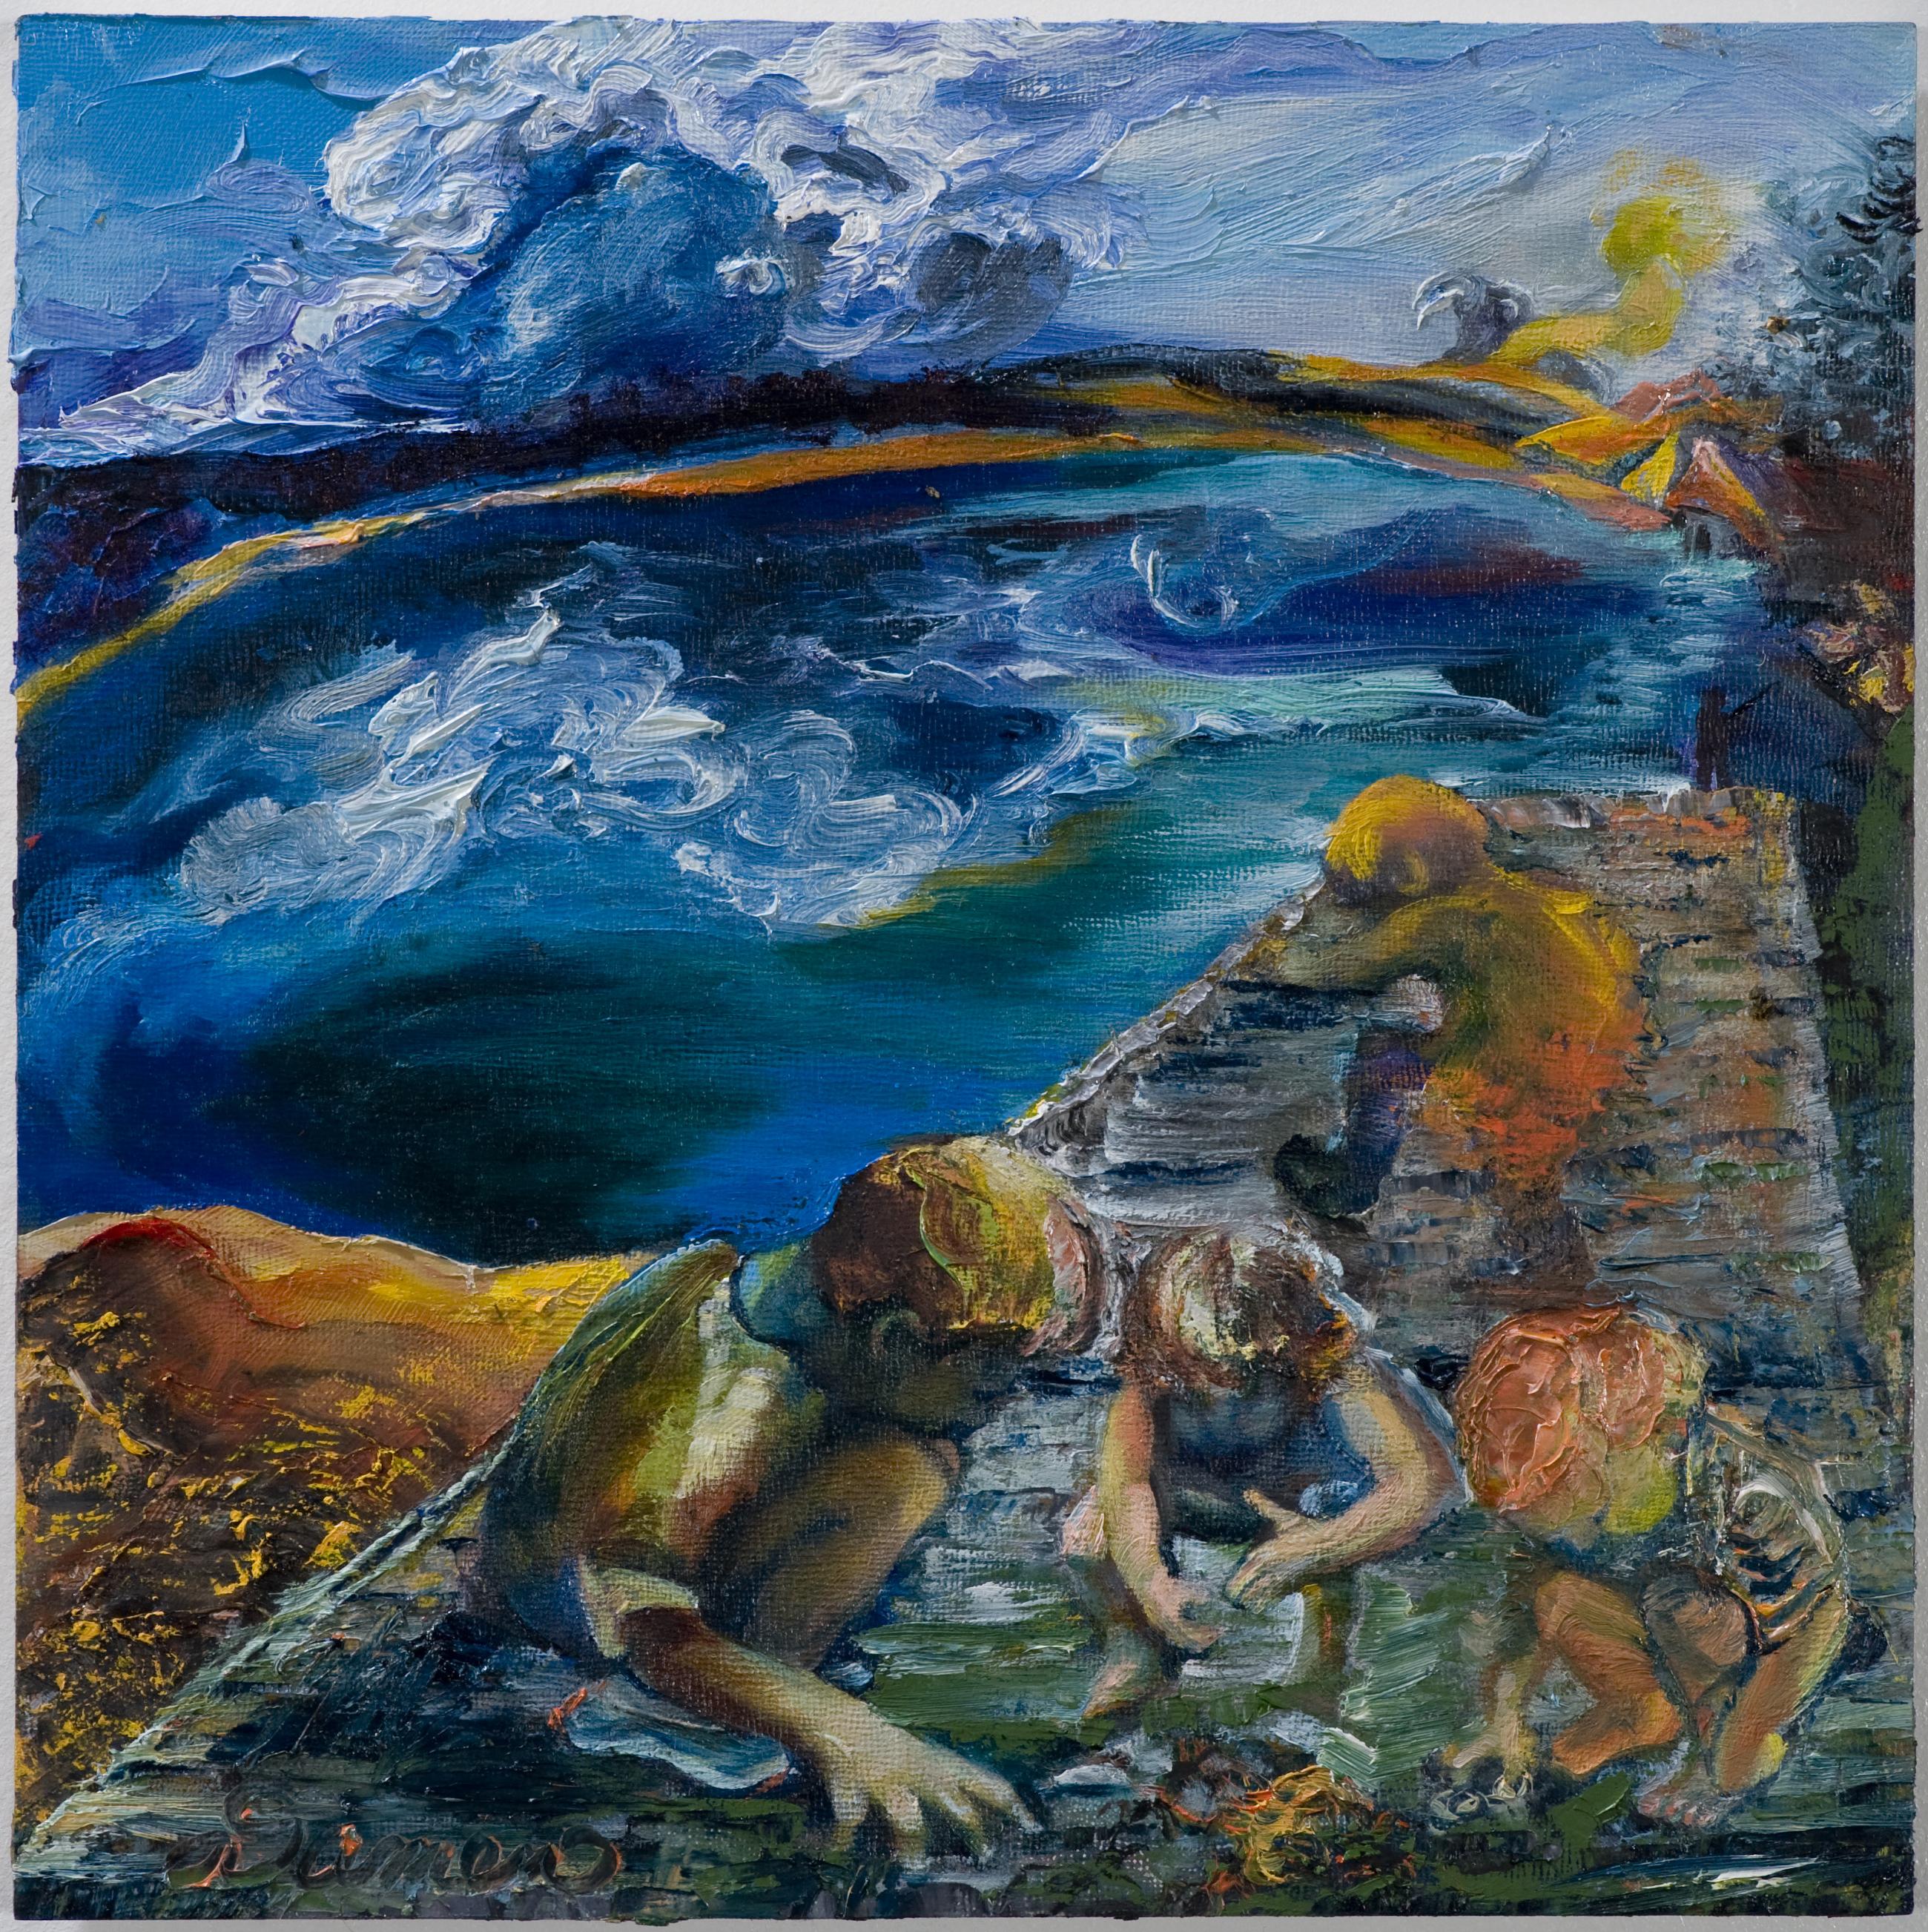 responsive painting to poem, memory, ants, teaching